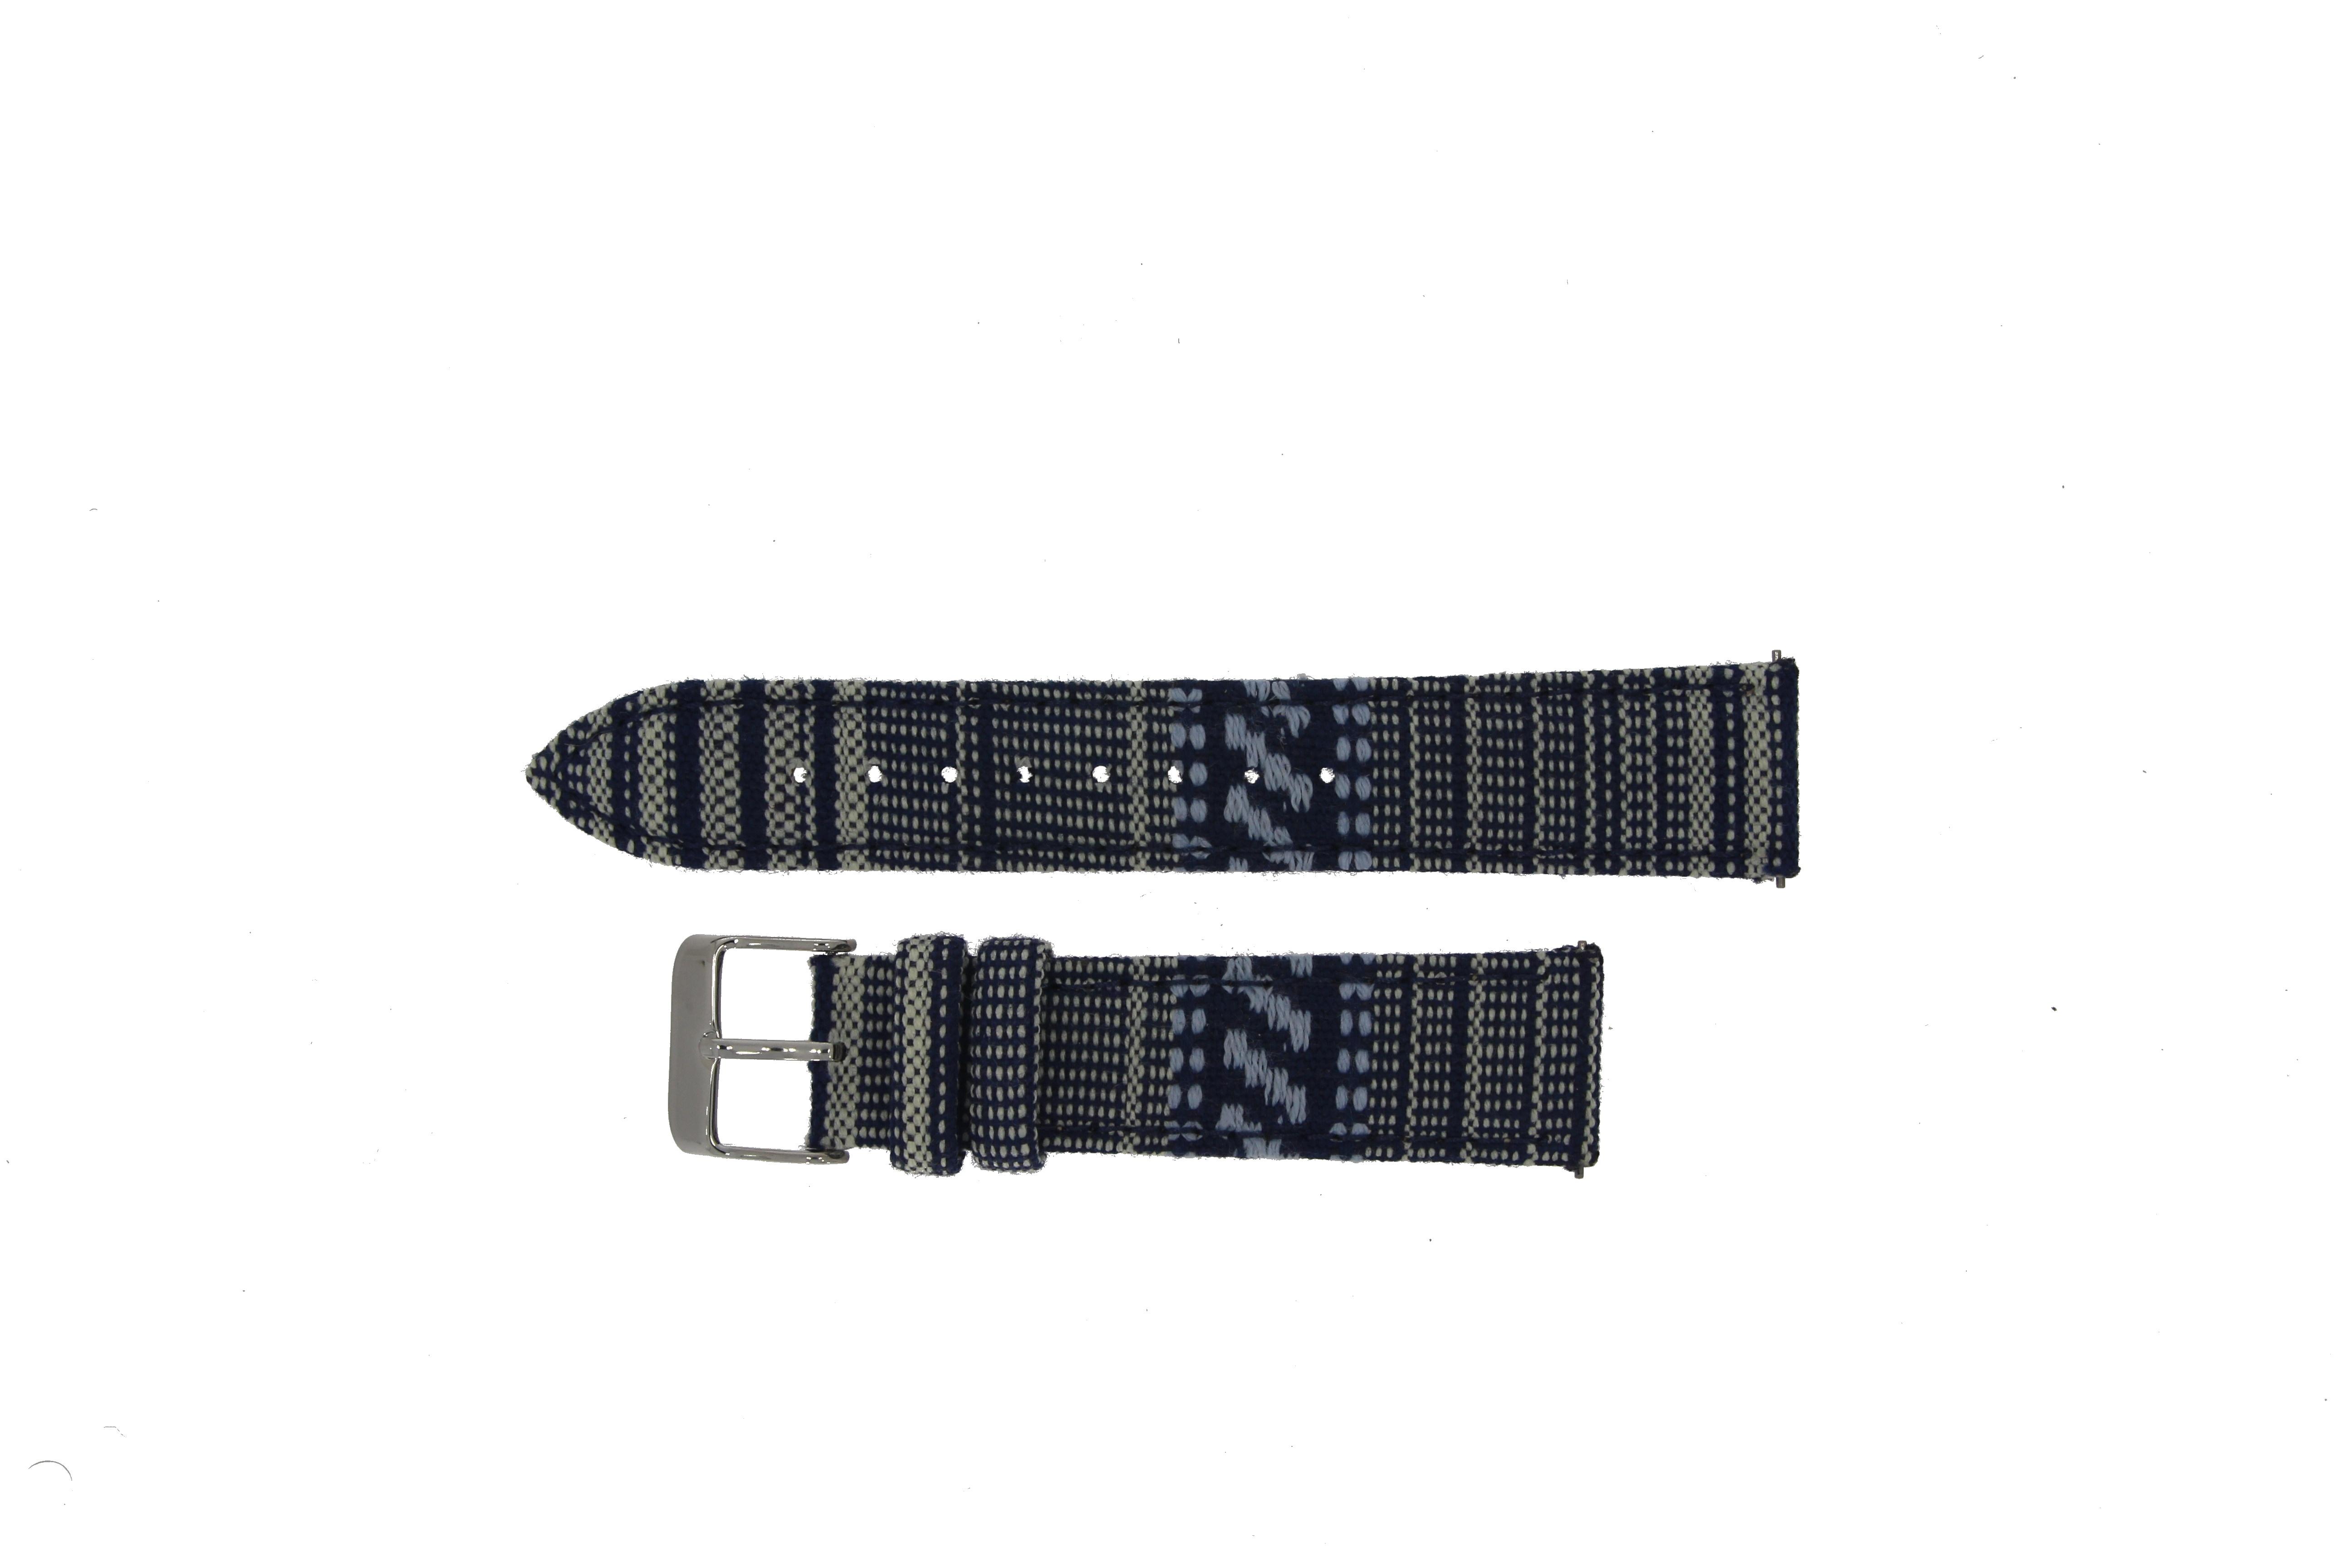 Textil - Leder - Band (20mm) blue motif für Samsung Galaxy